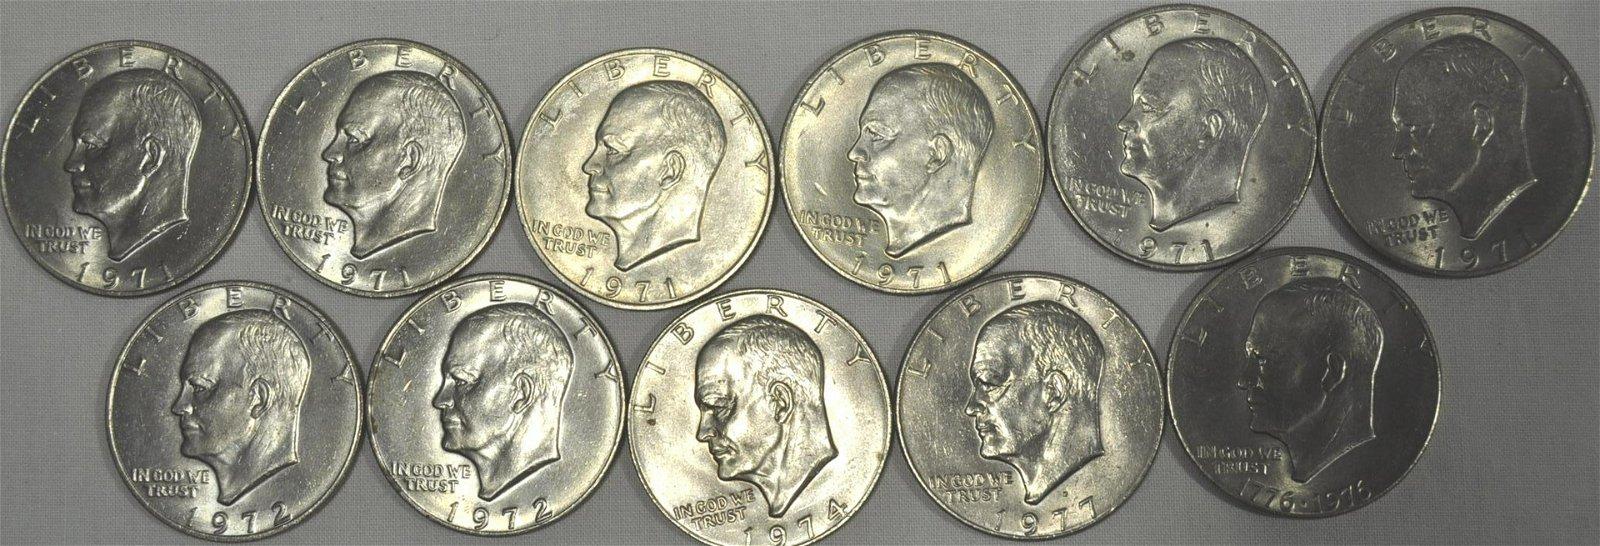 11) Eisenhower Dollars